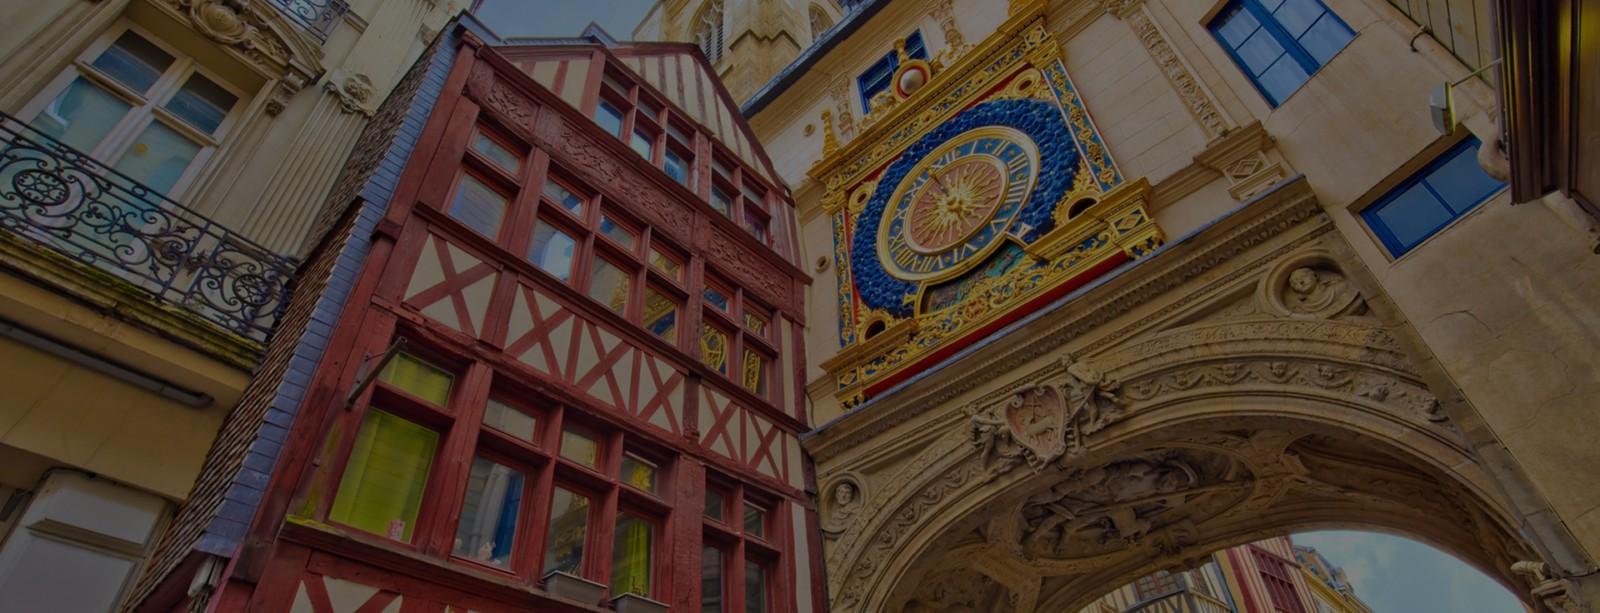 Rouen Accueil